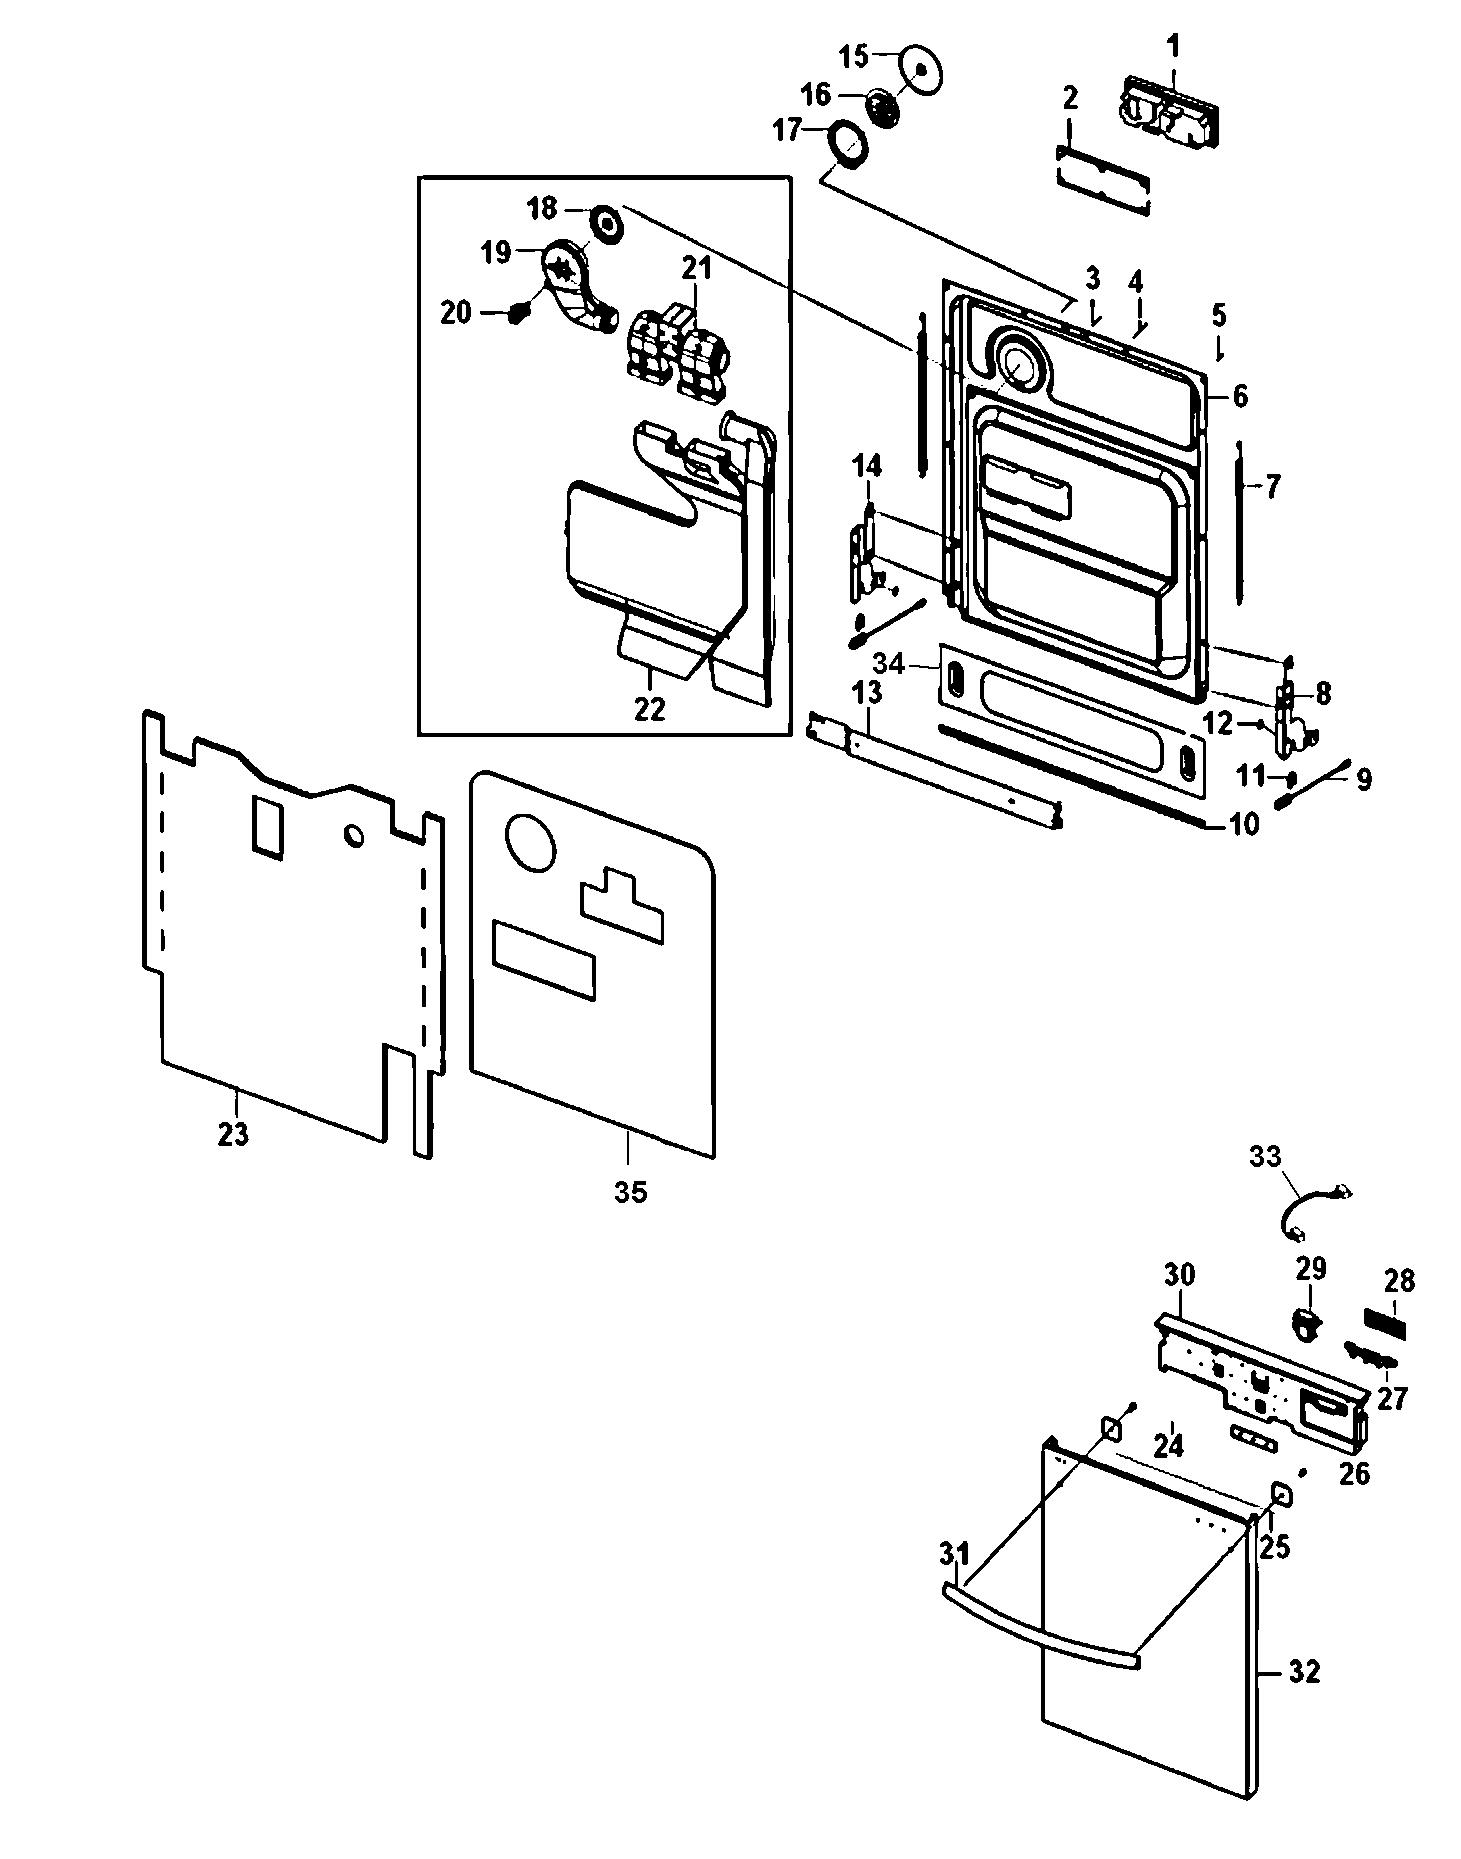 Samsung model DMT400RHW/XAA dishwasher genuine parts